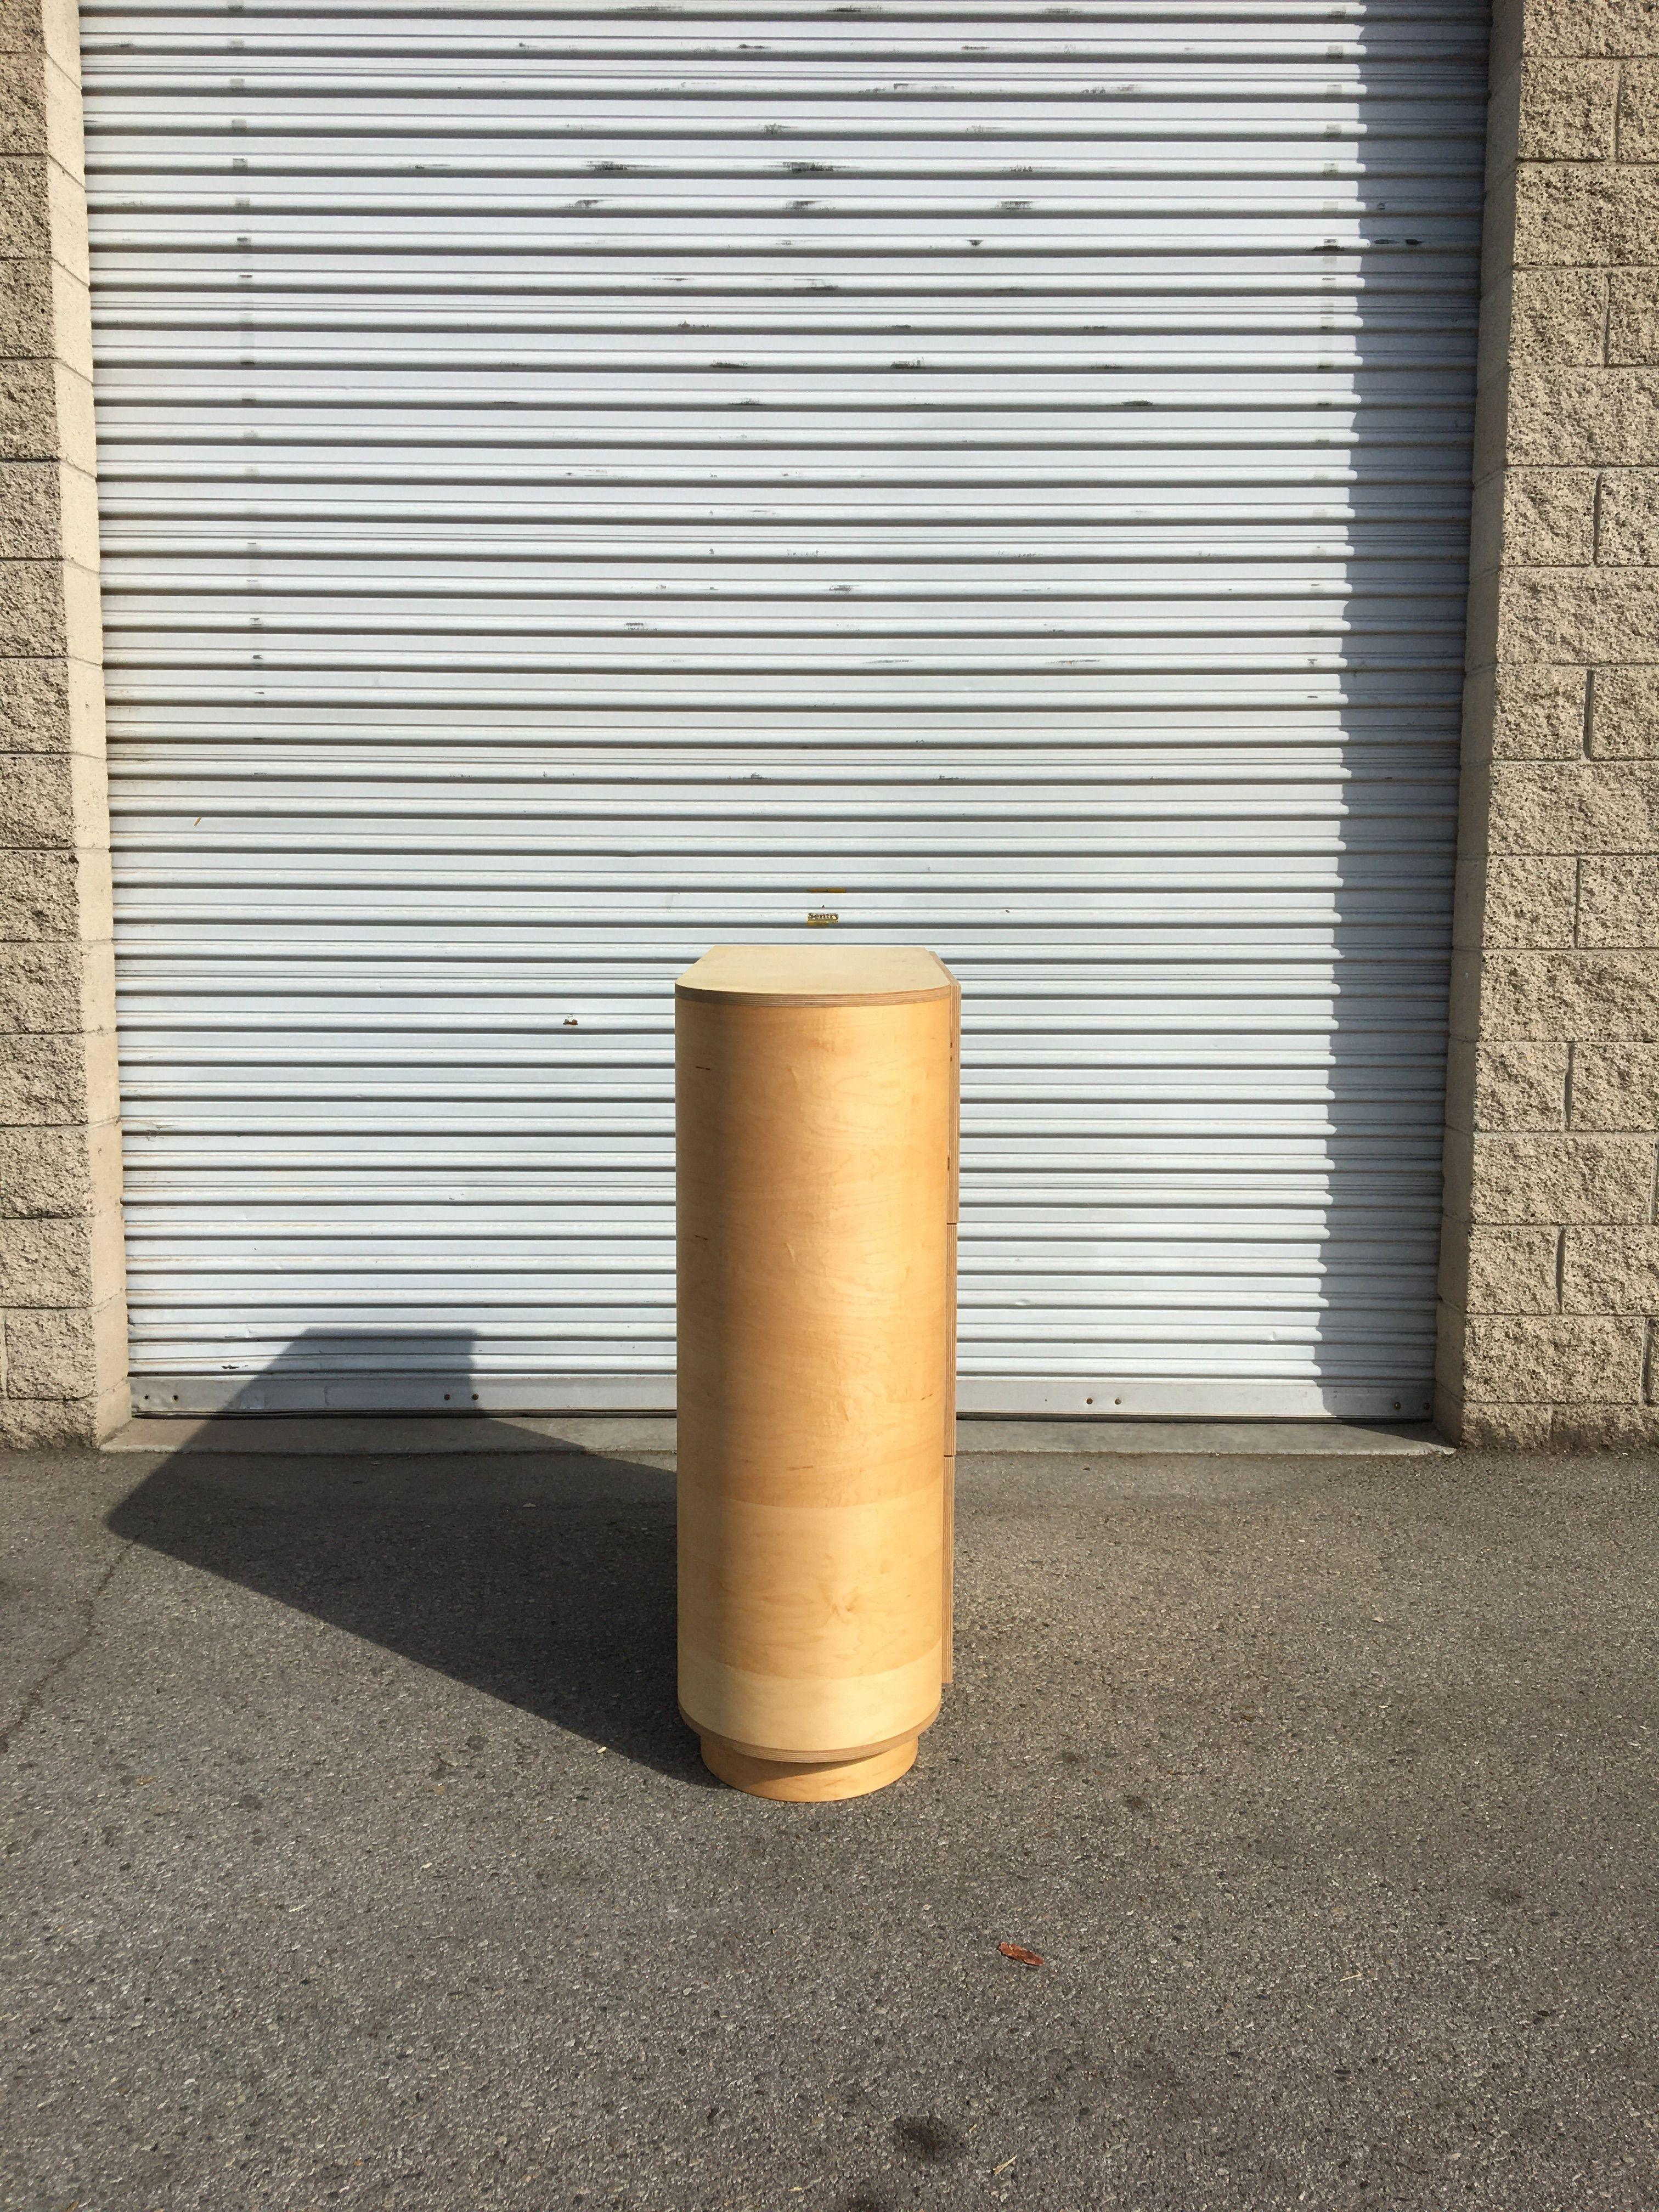 Half Round Dresser - Narrow product image 2